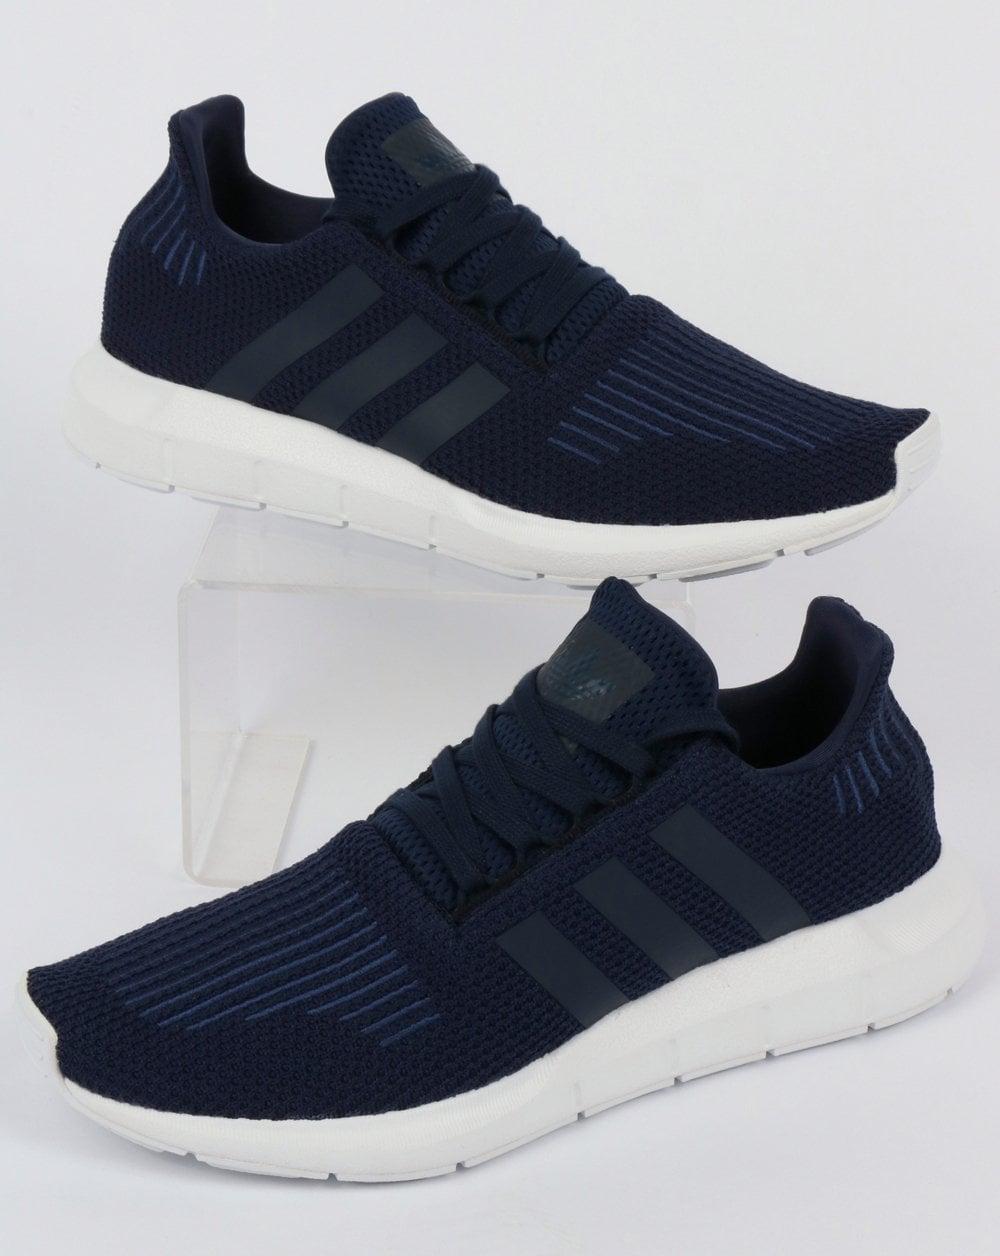 Adidas Swift Run Trainers Navy blue